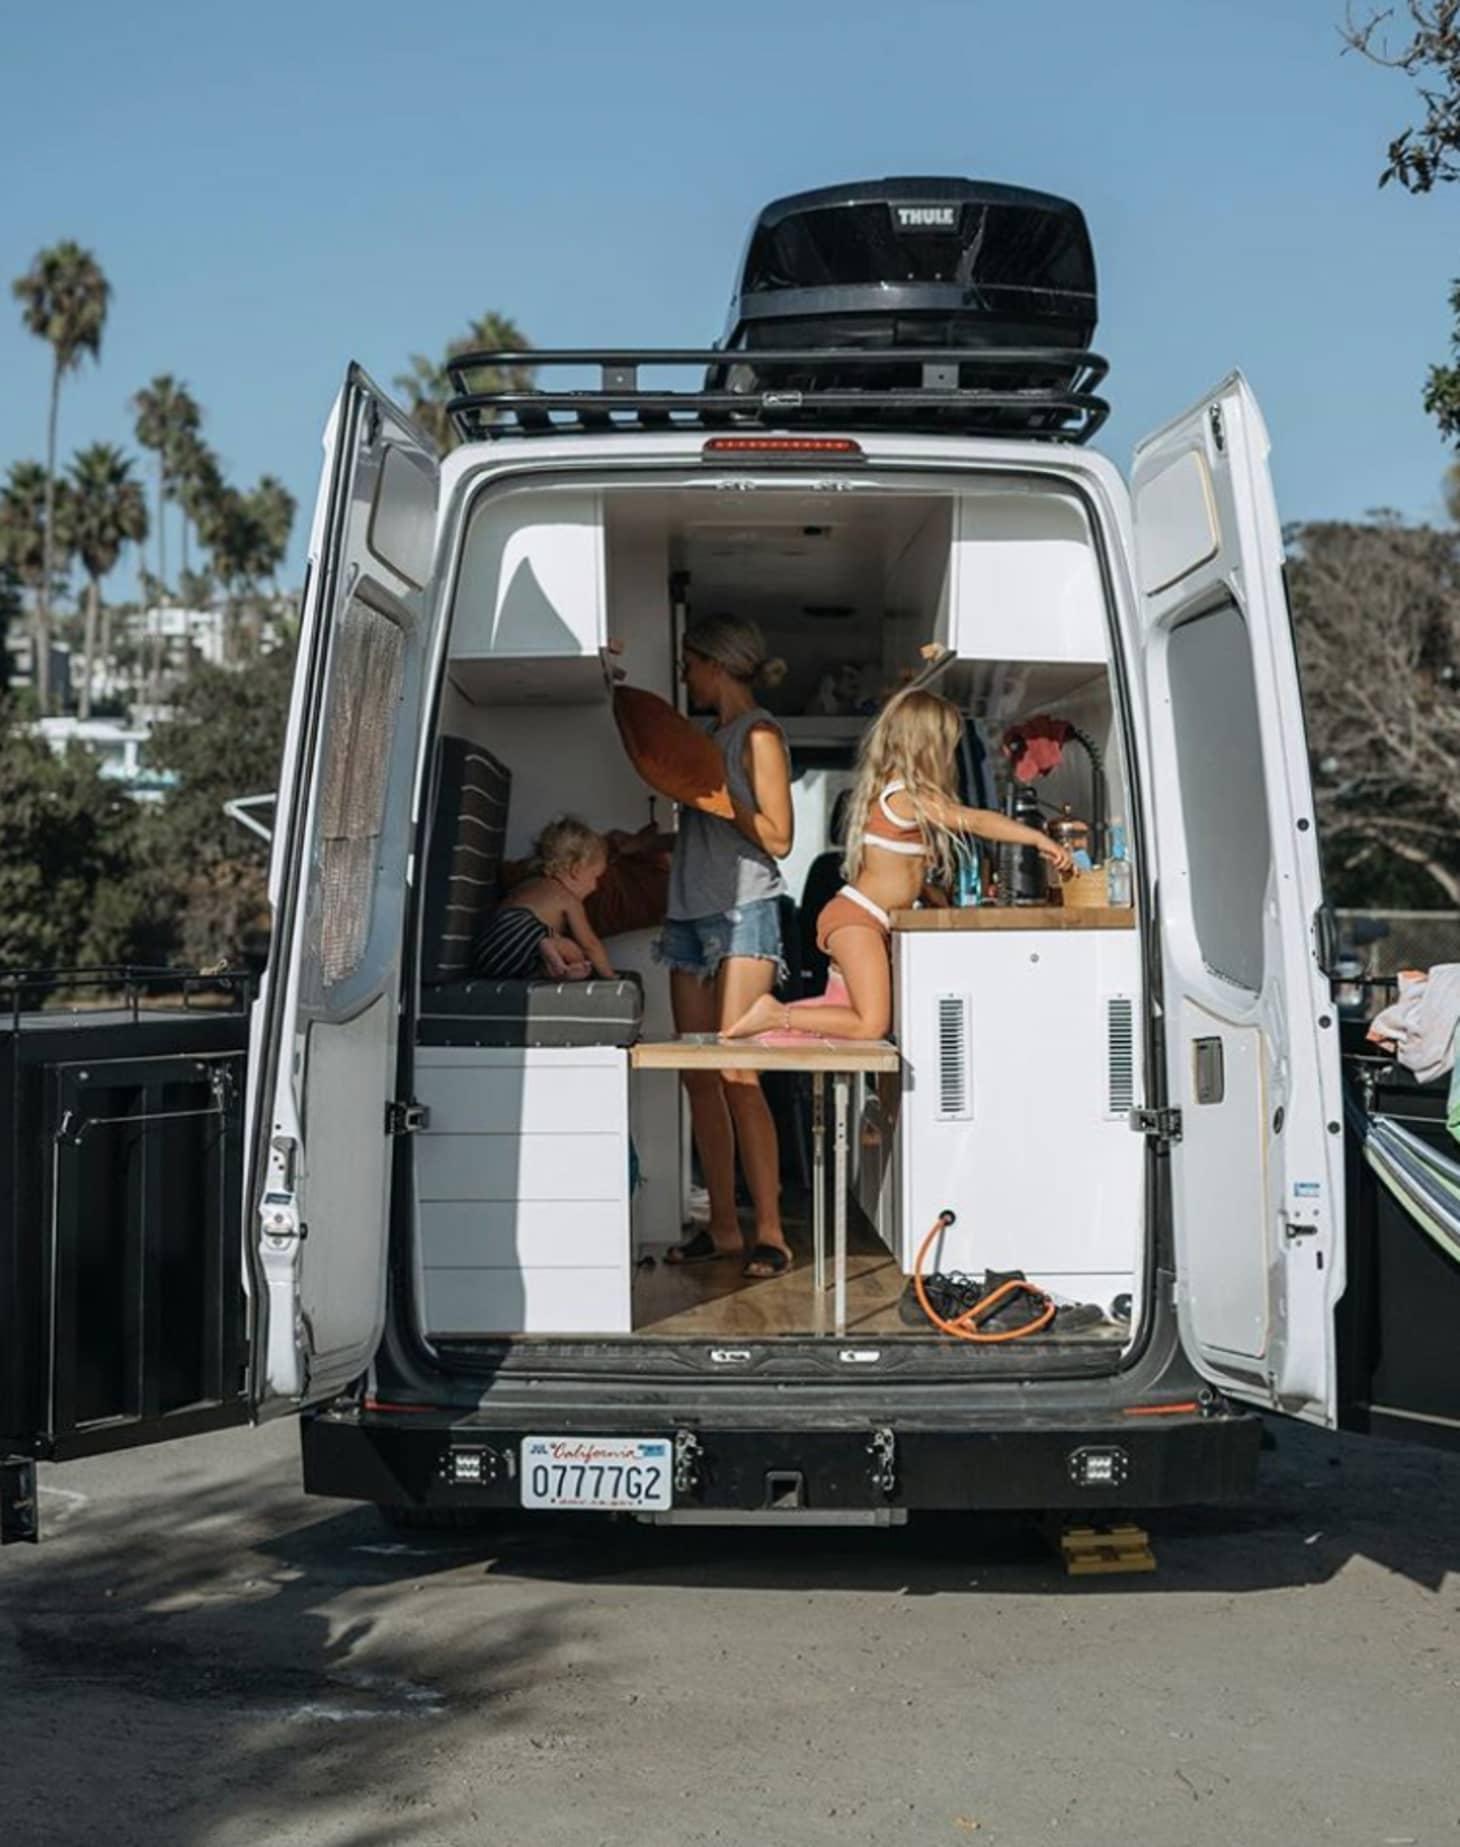 Mercedes Sprinter Van Life - Converted Home Photos